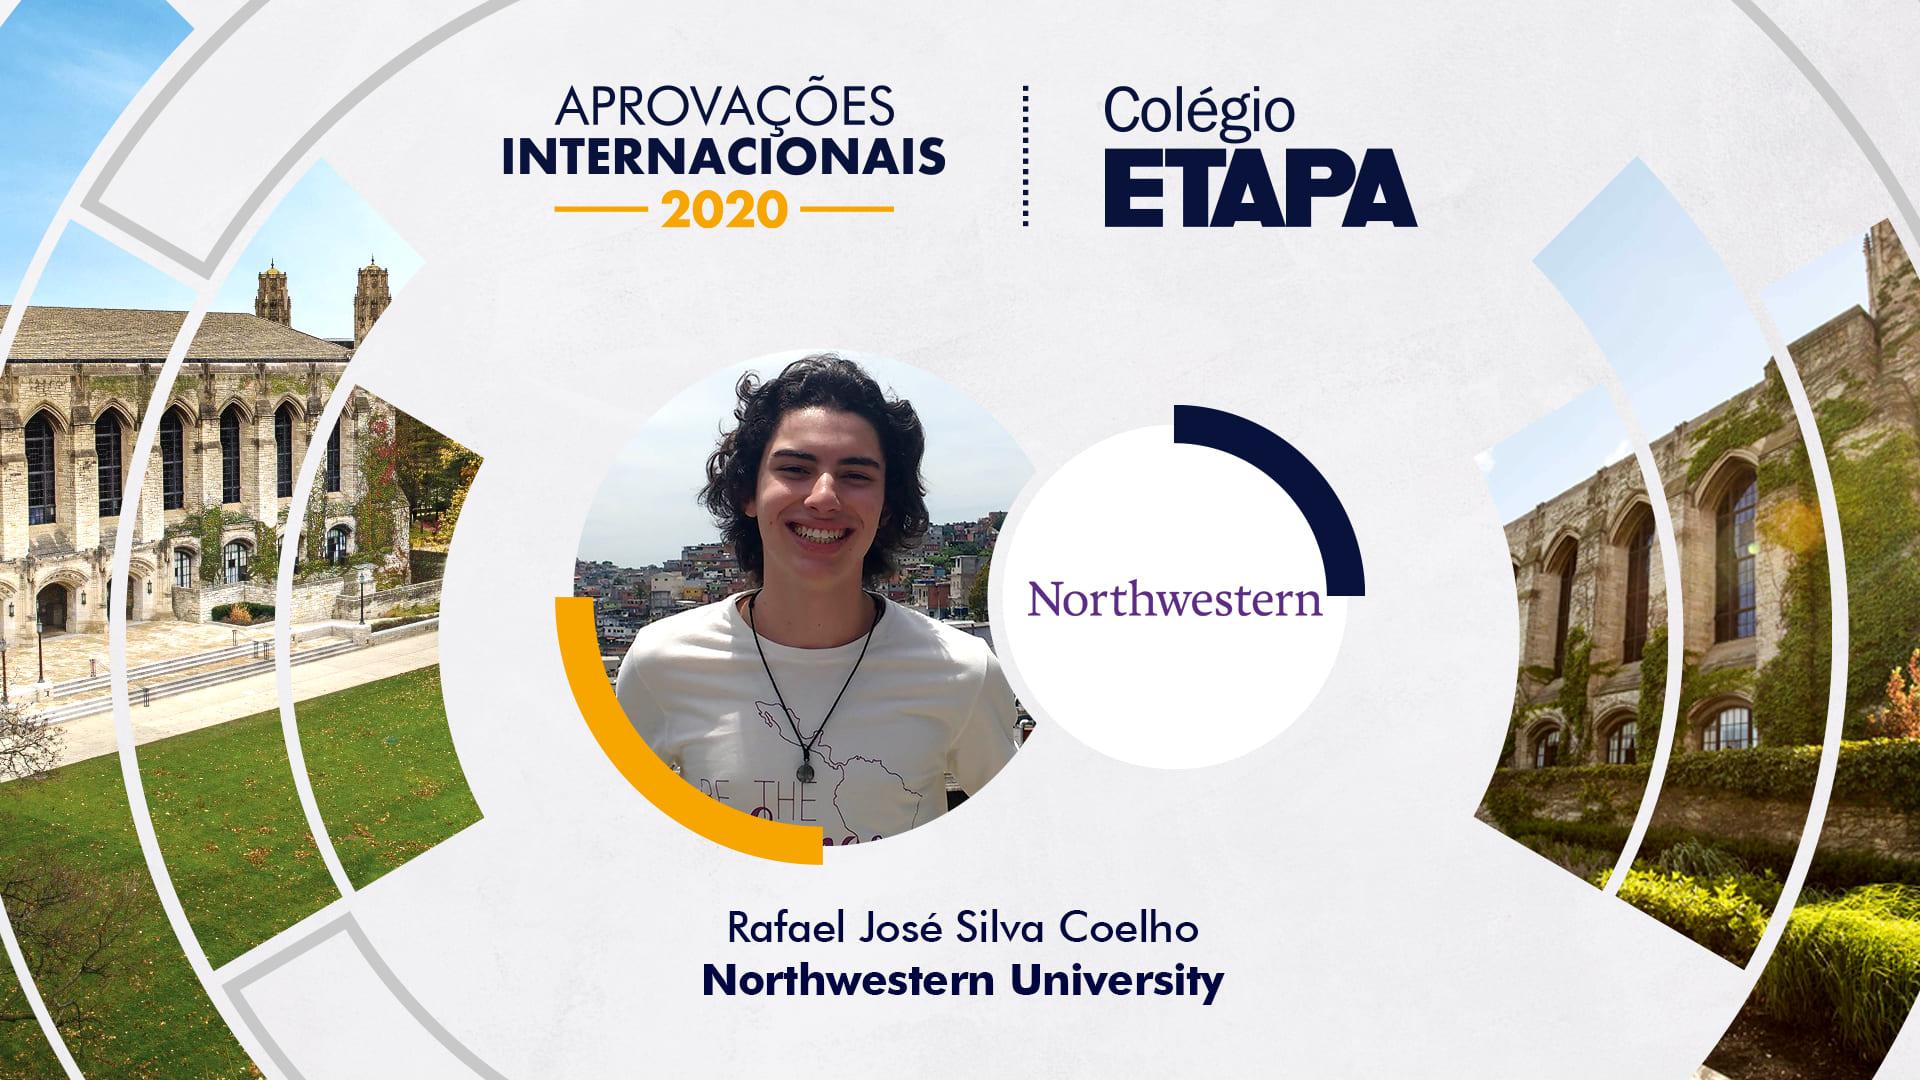 Aprovações Internacionais 2020: Rafael José Silva Coelho